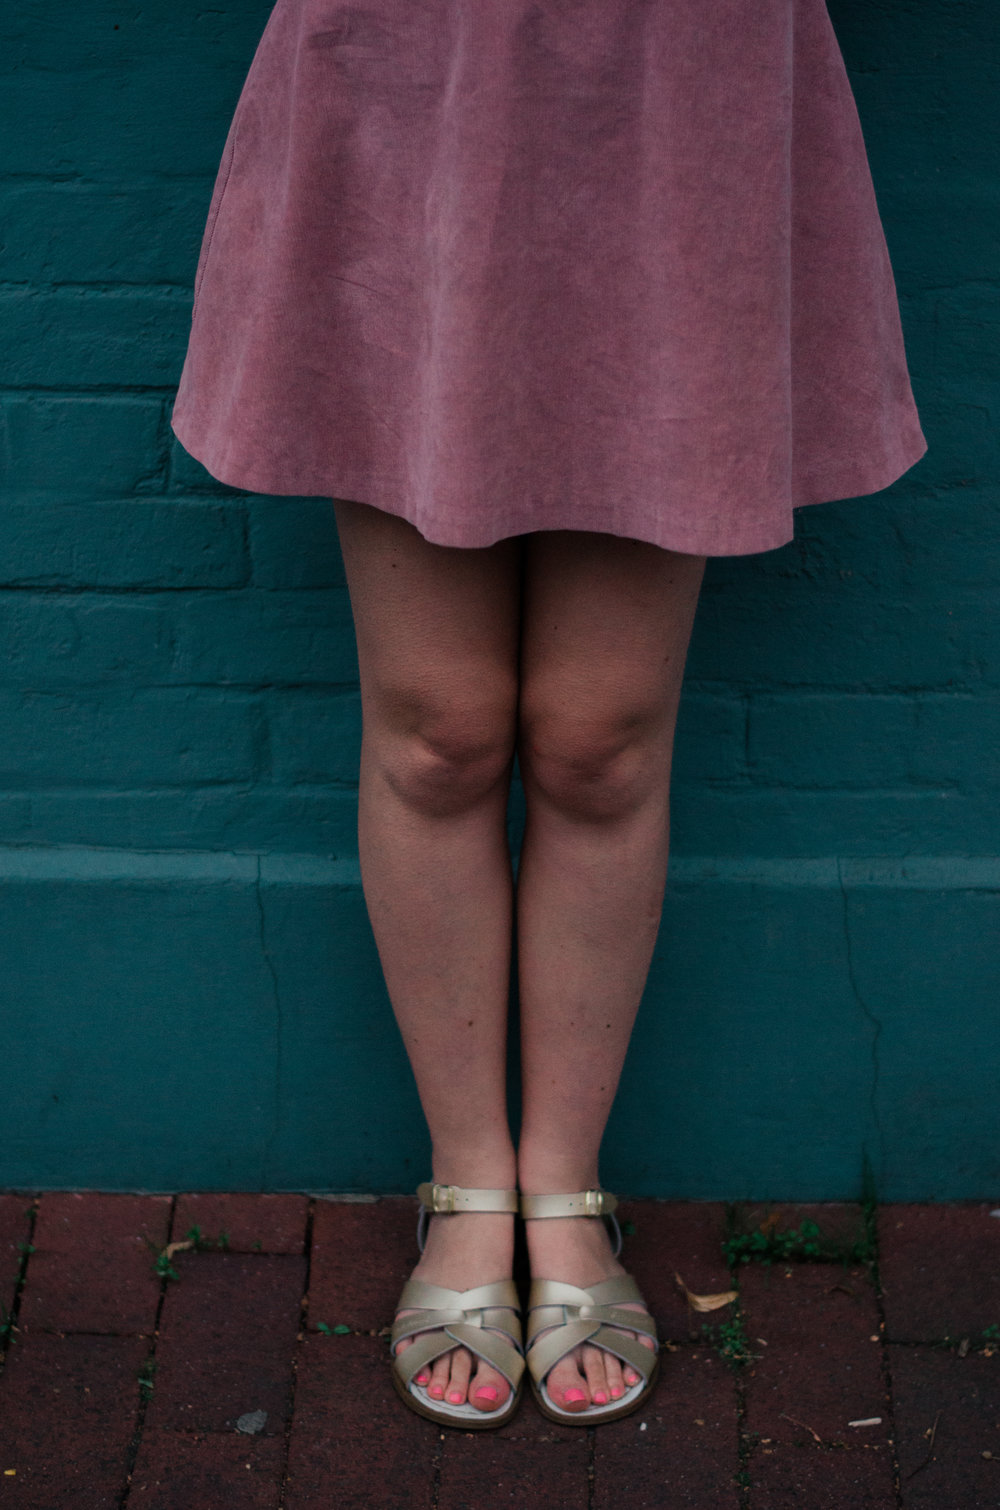 Ellie-Portrait-Session-Aiste-Saulyte-Photography-11-8-17-359.jpg